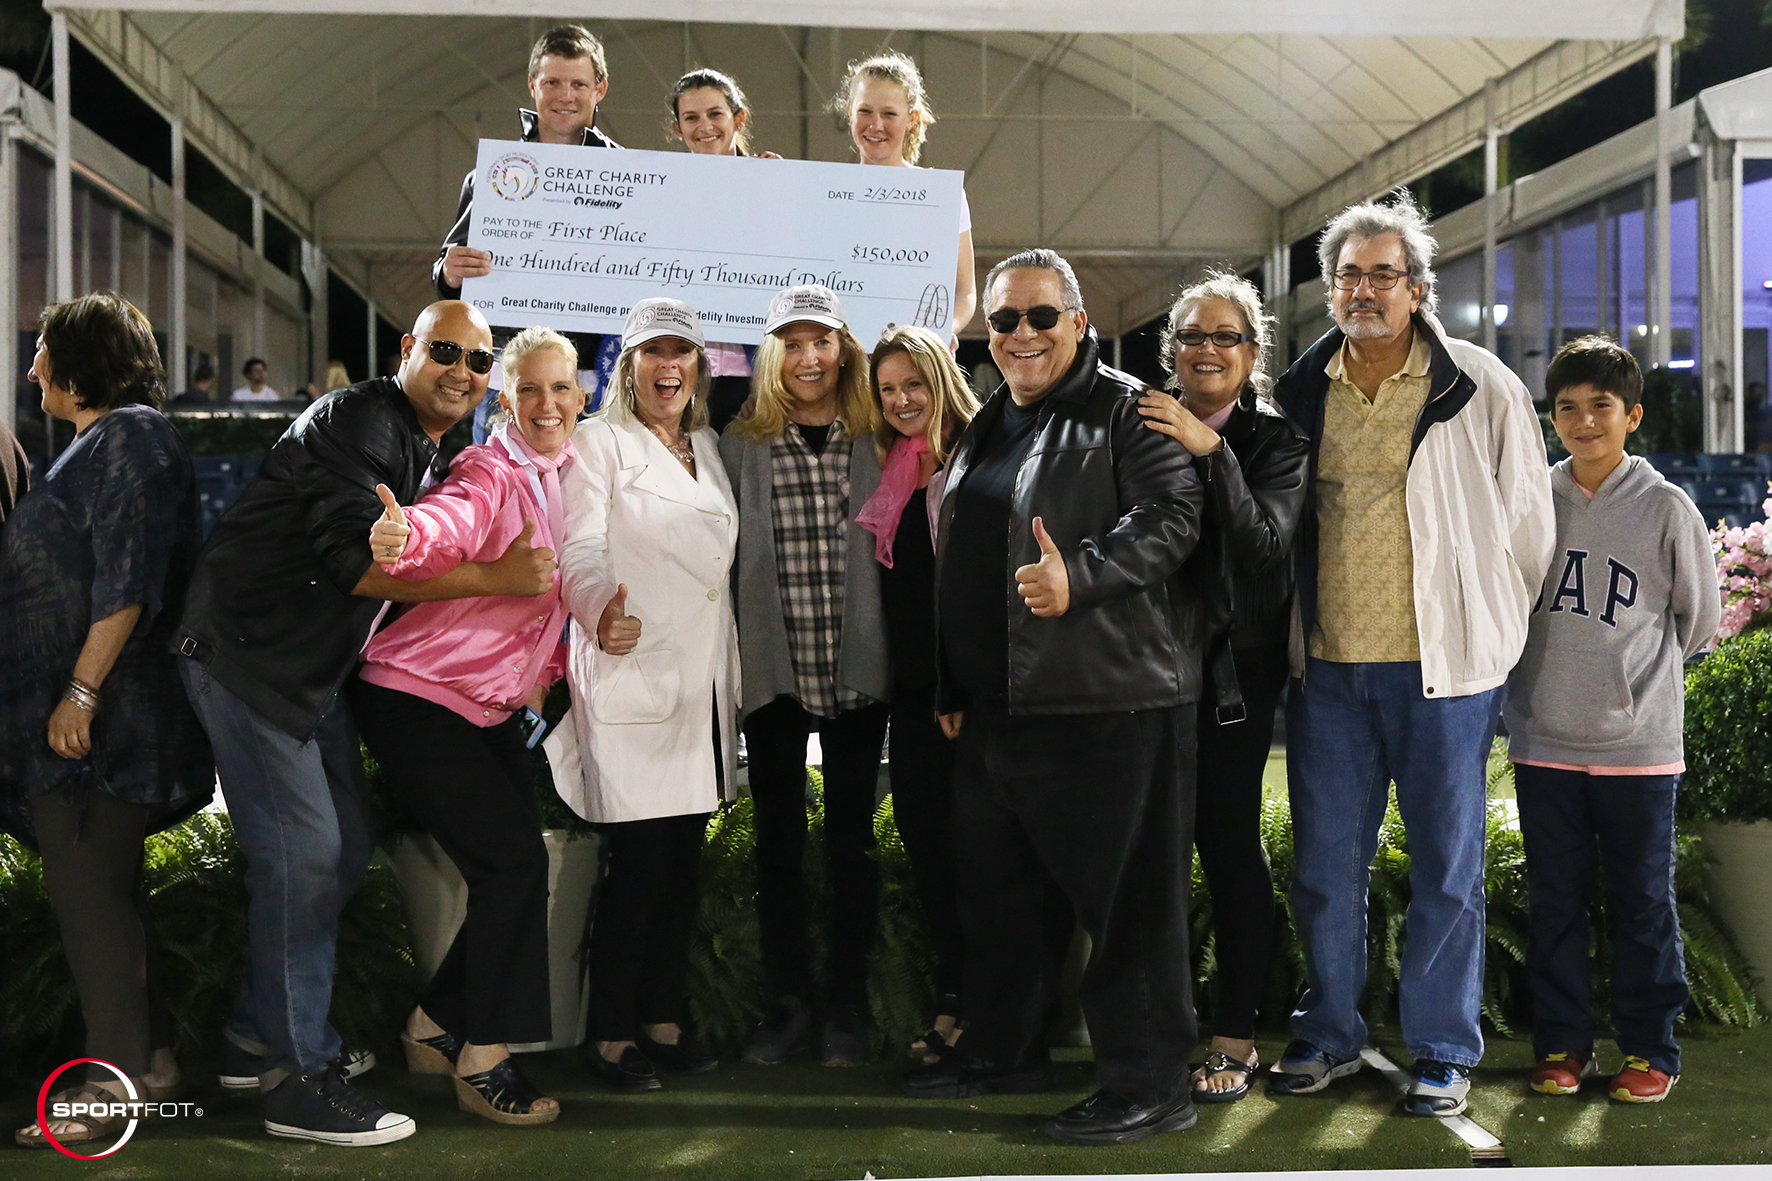 Education Foundation winning team GCC pres 298_9605 Sportfot